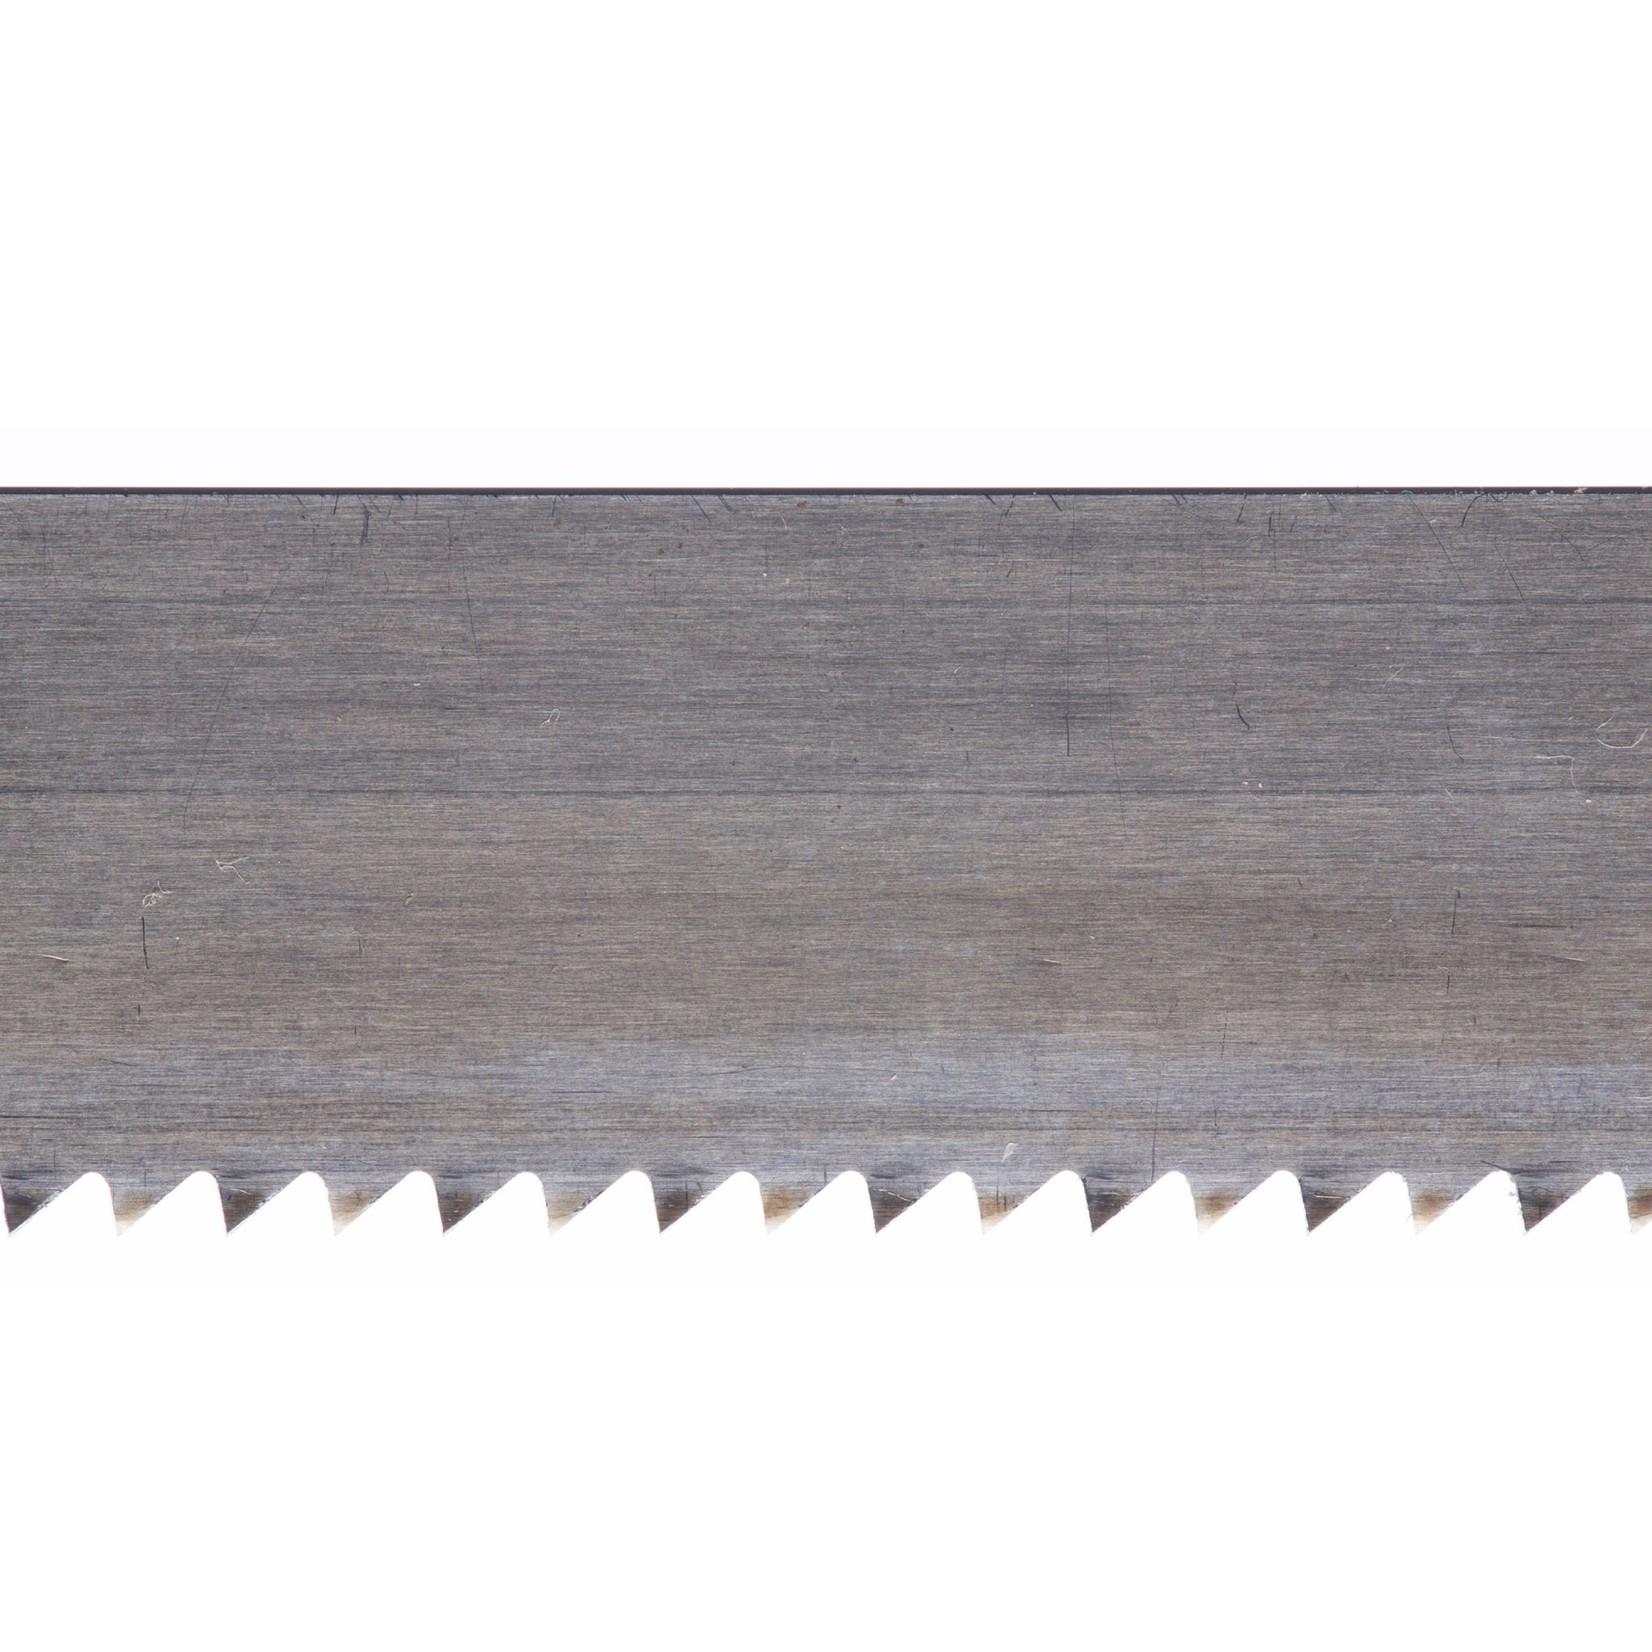 Agawa Agawa Boreal Replacement Blades